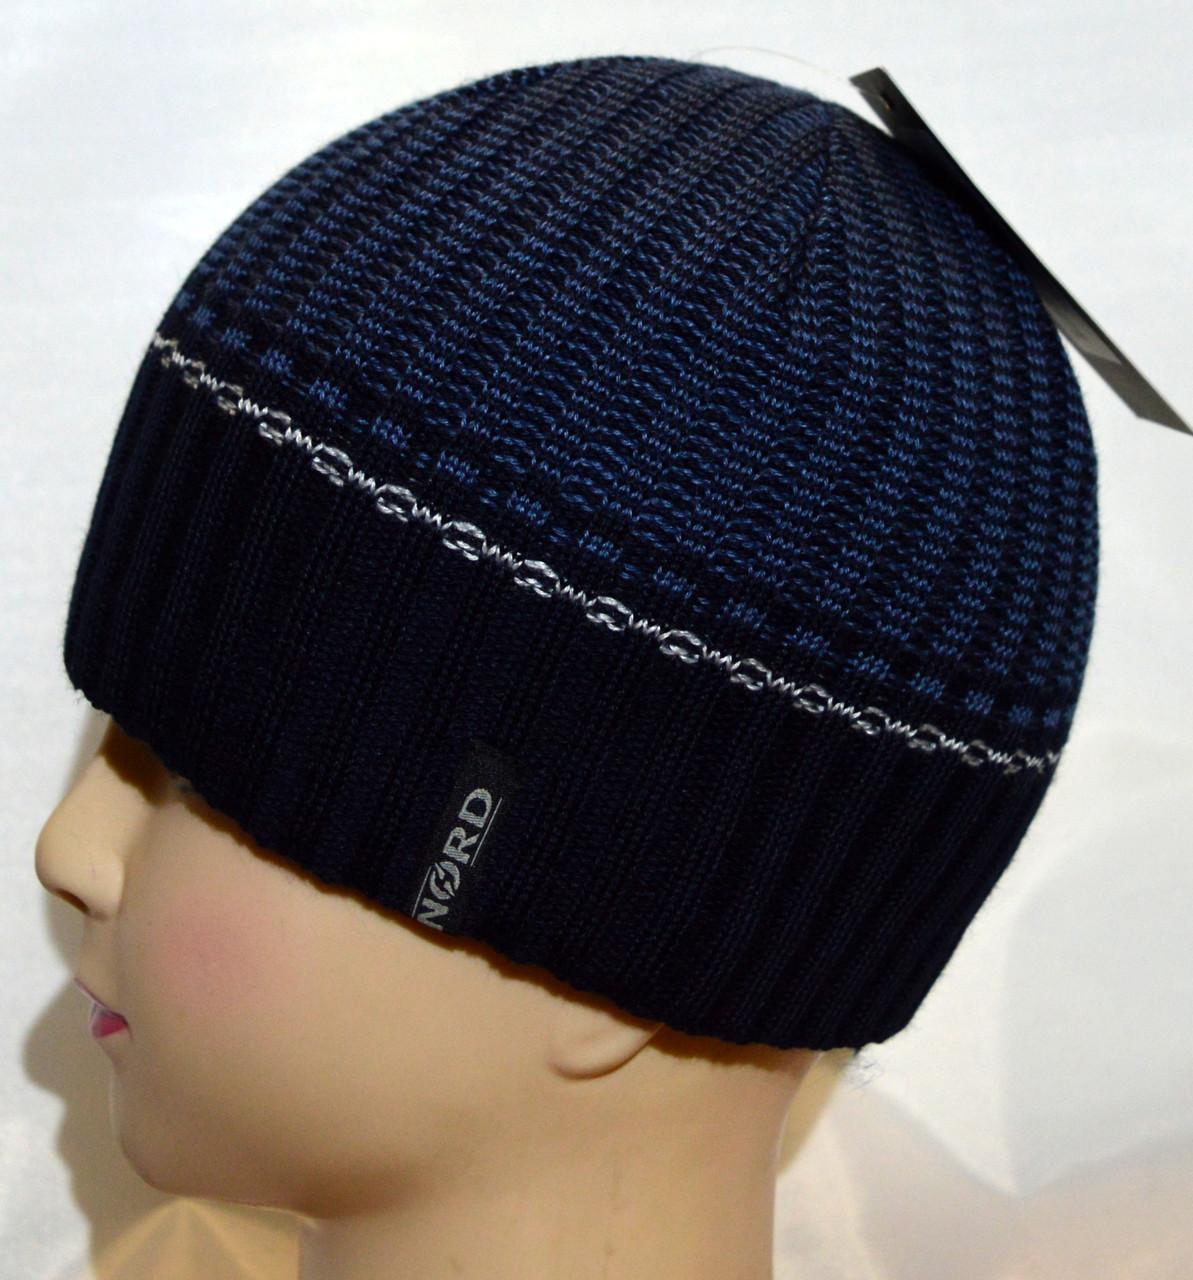 Мужская вязаная шапка на флисе 15047А синий+джинс